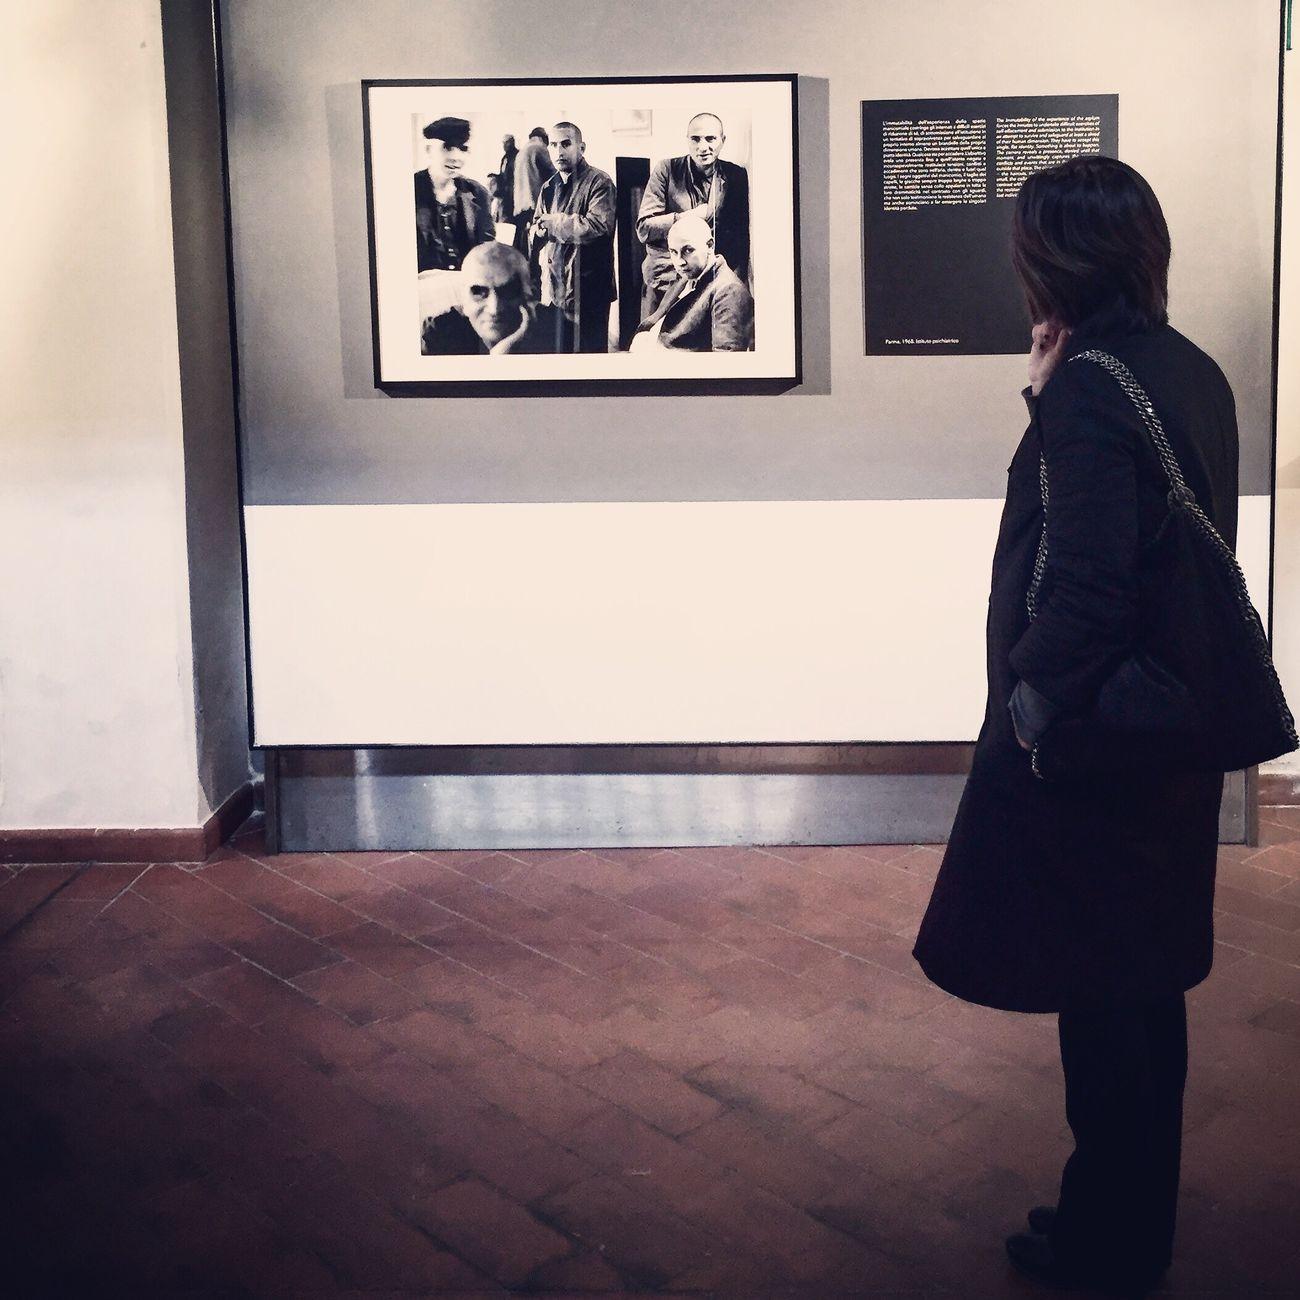 Exhibition Museum Culture Photography Caos Terni Umbria